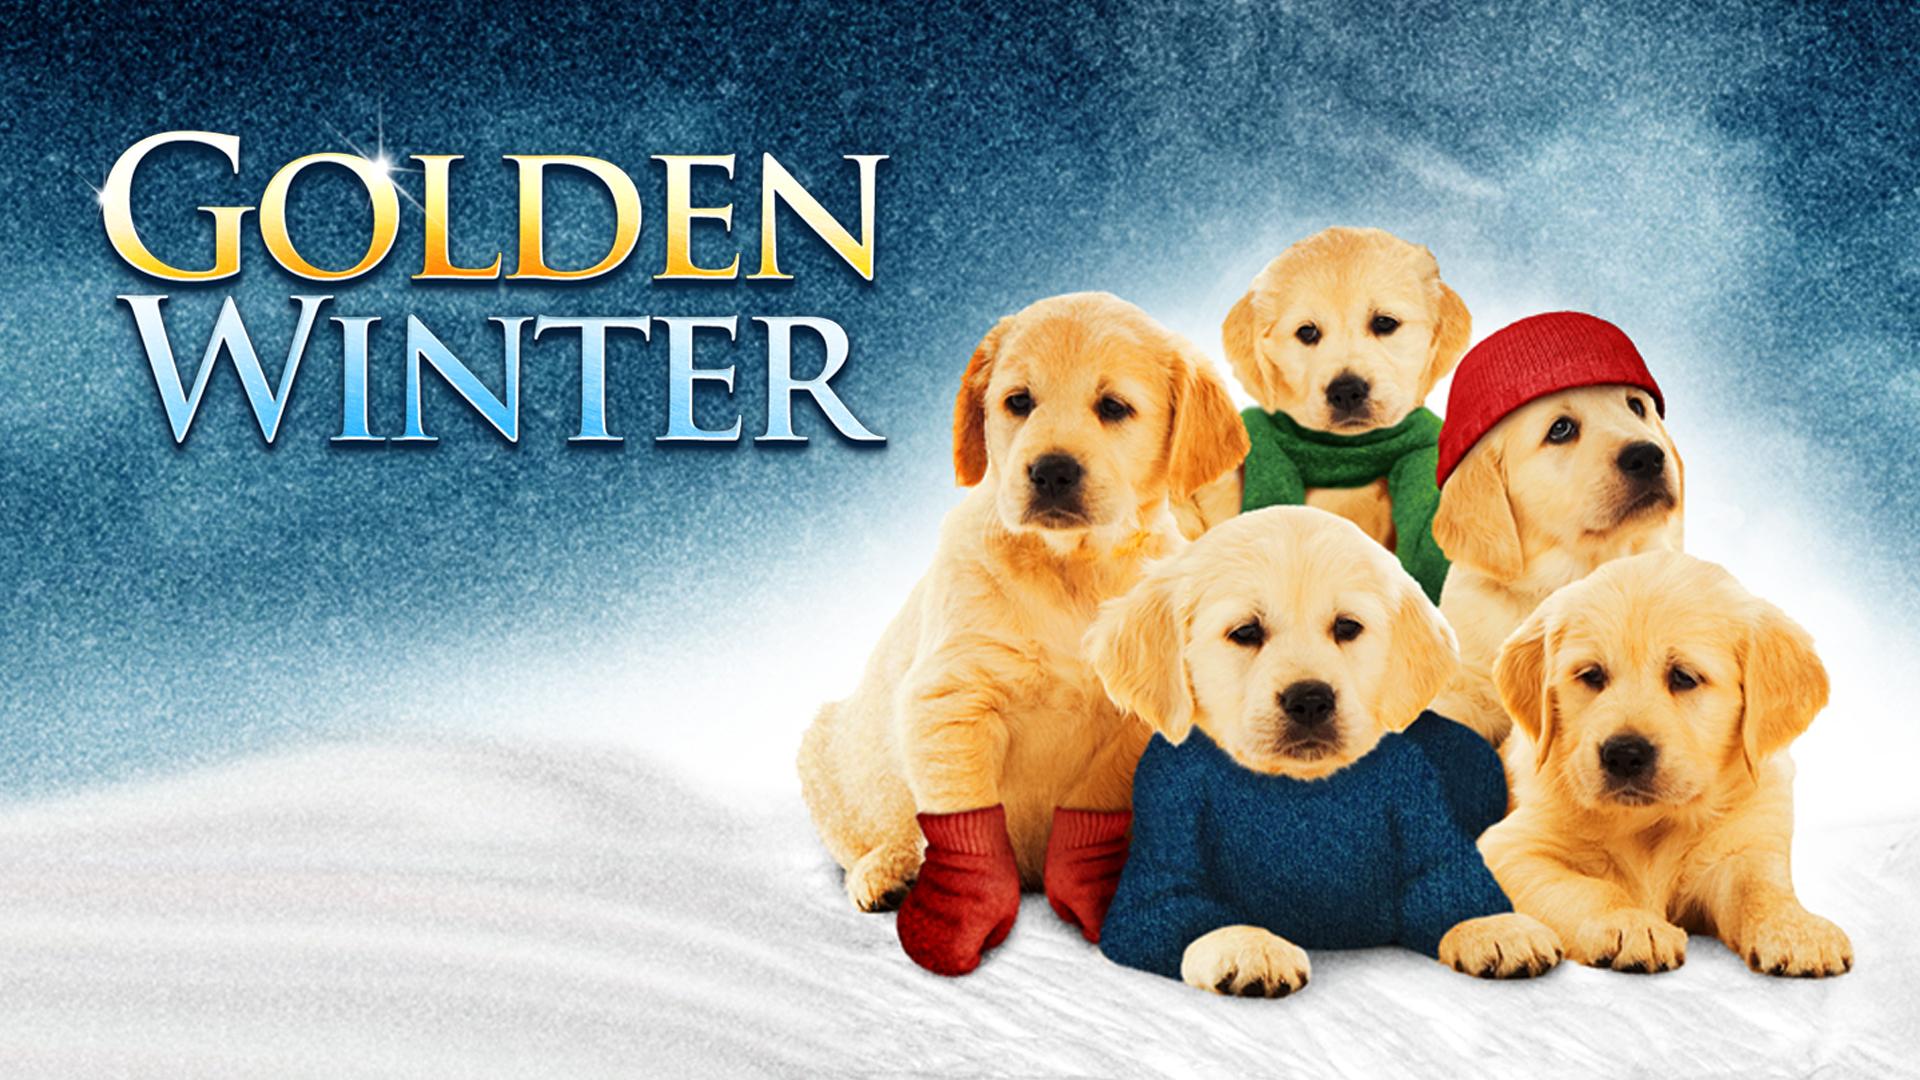 Golden Winter